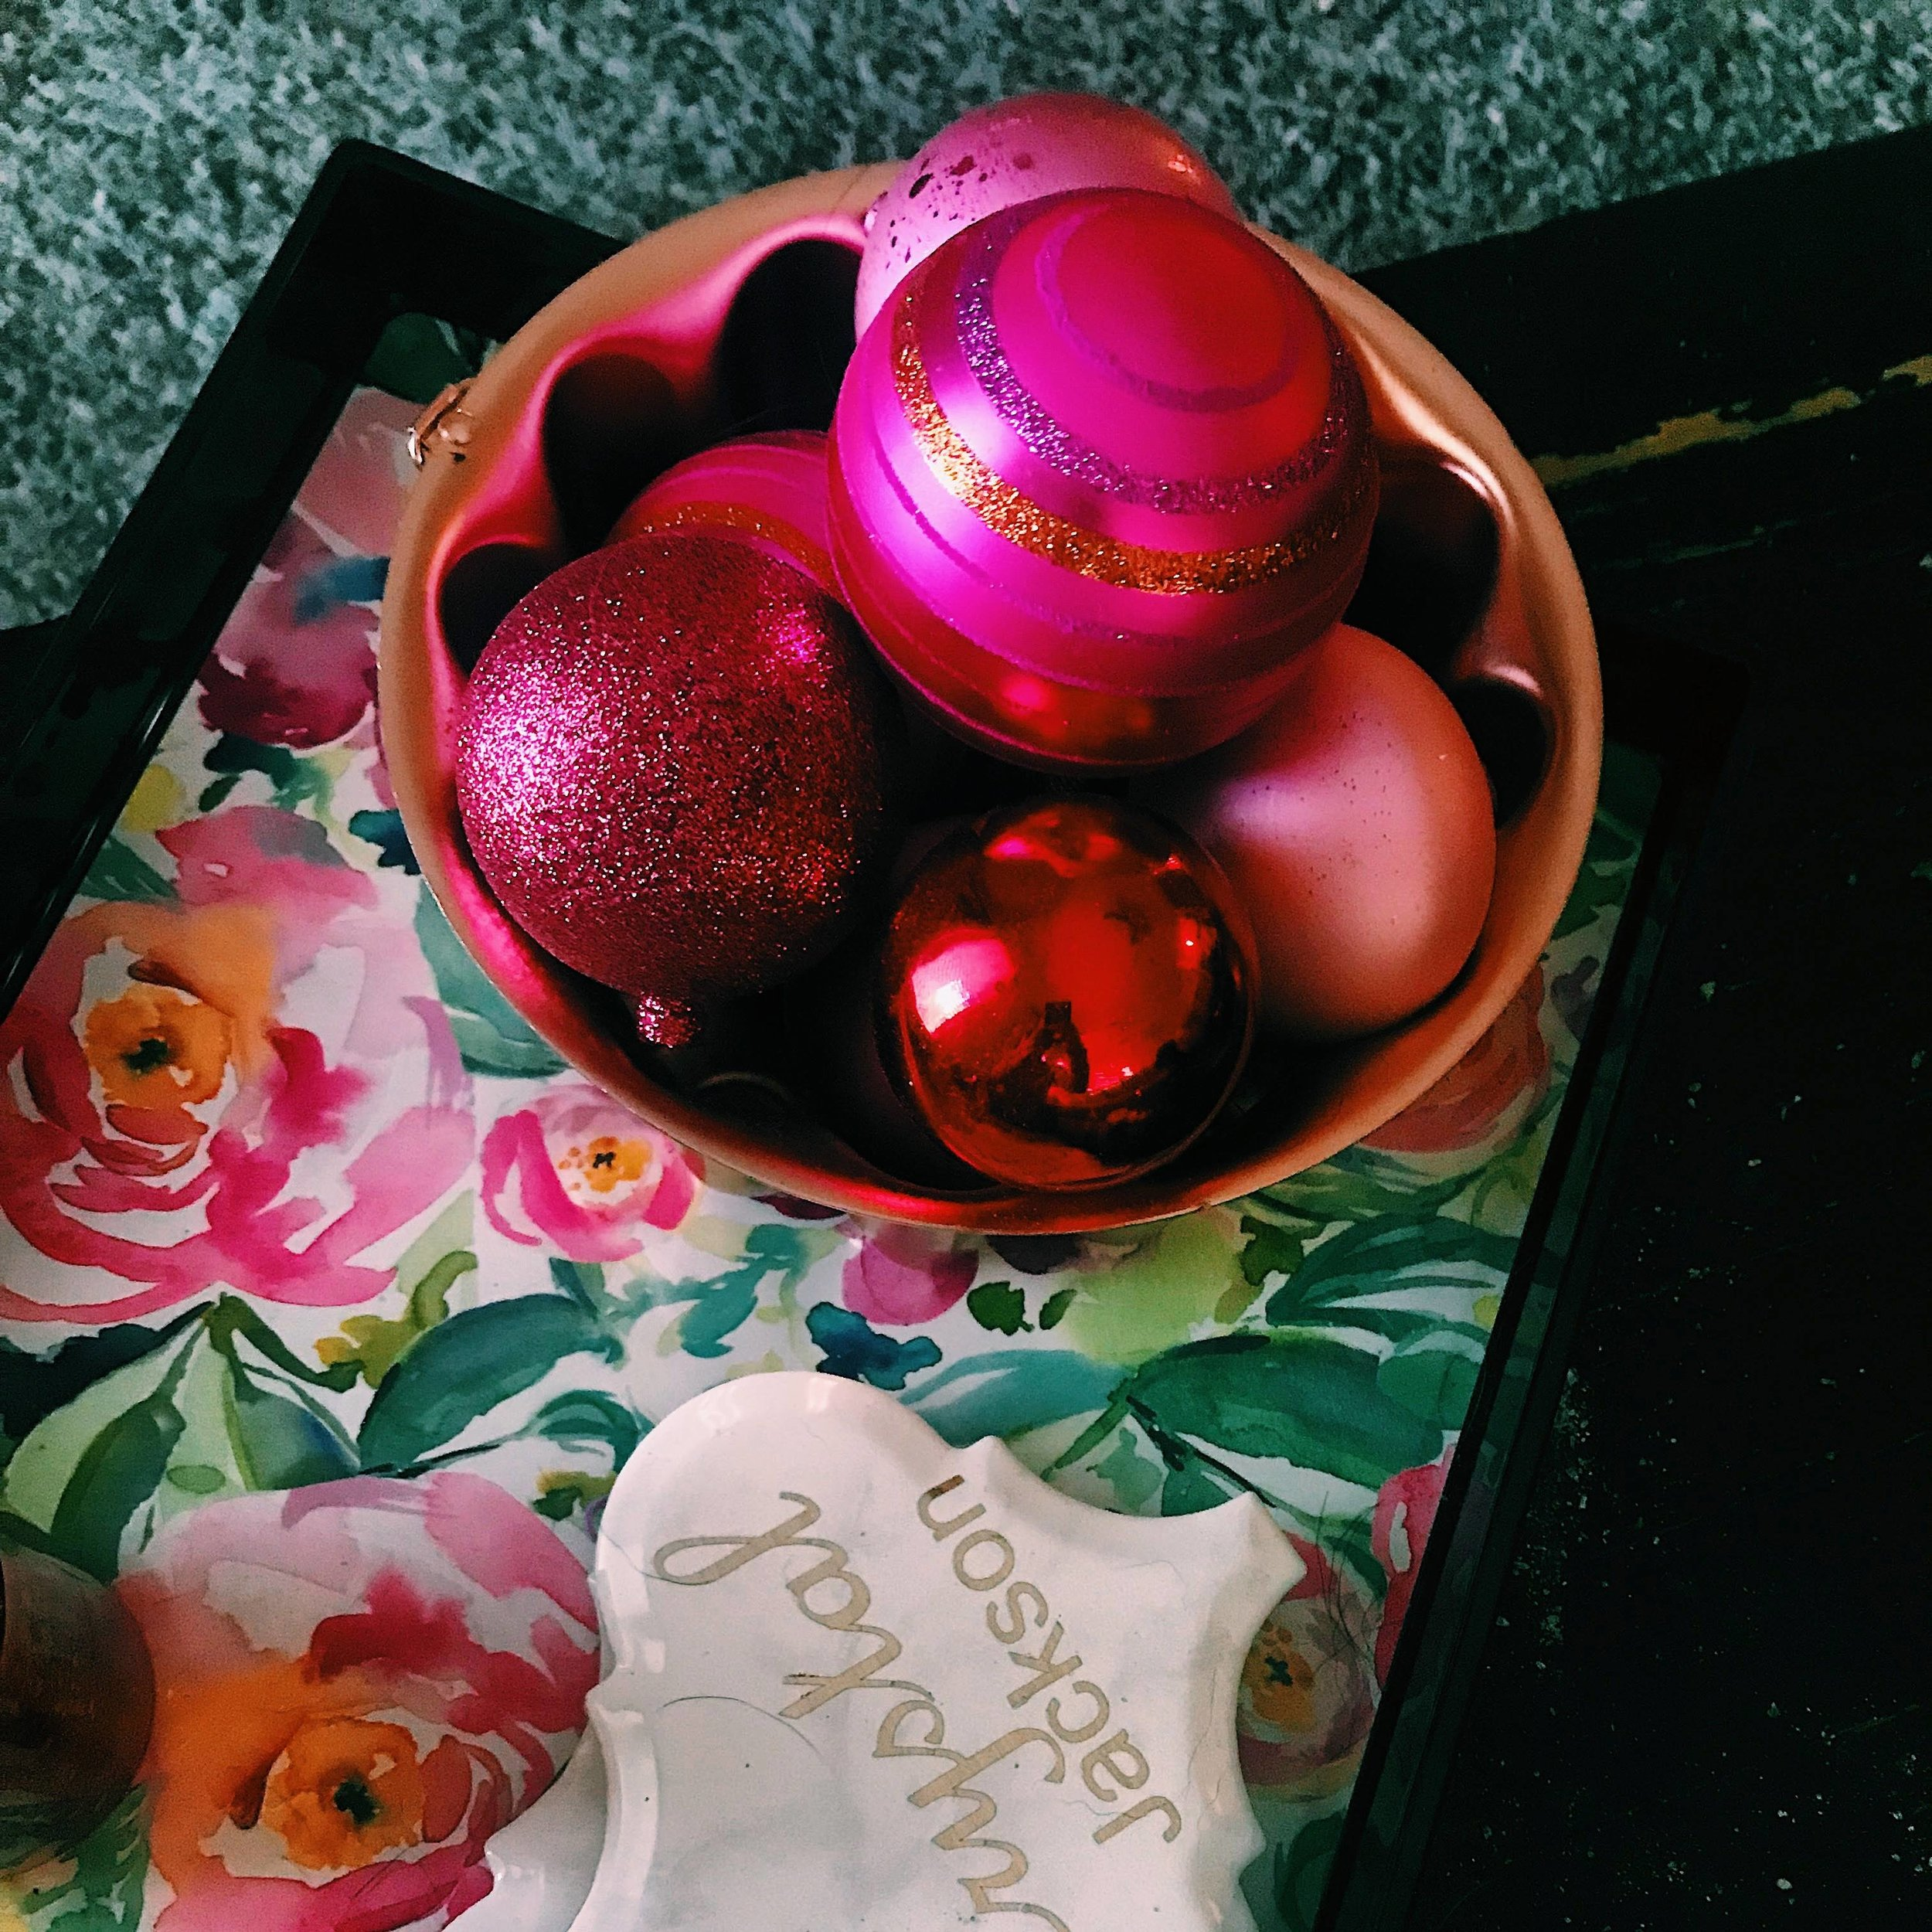 Three Heel Clicks - Cheerful Holiday Posts for Everyone (10).jpg